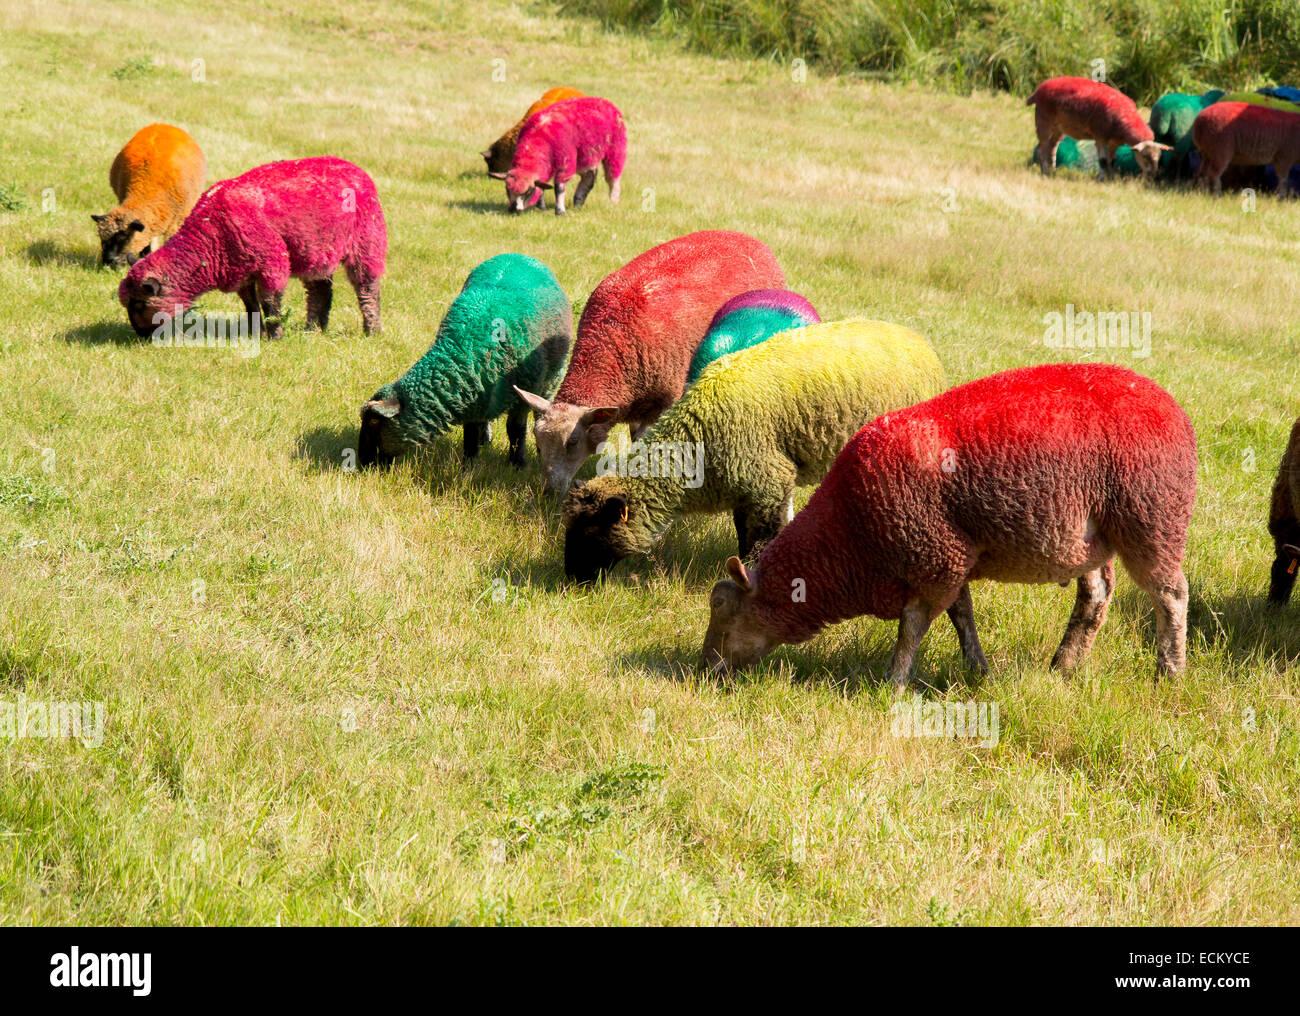 Latitude Festival, 18 July 2014: multicoloured sheep graze in a meadow, - Stock Image